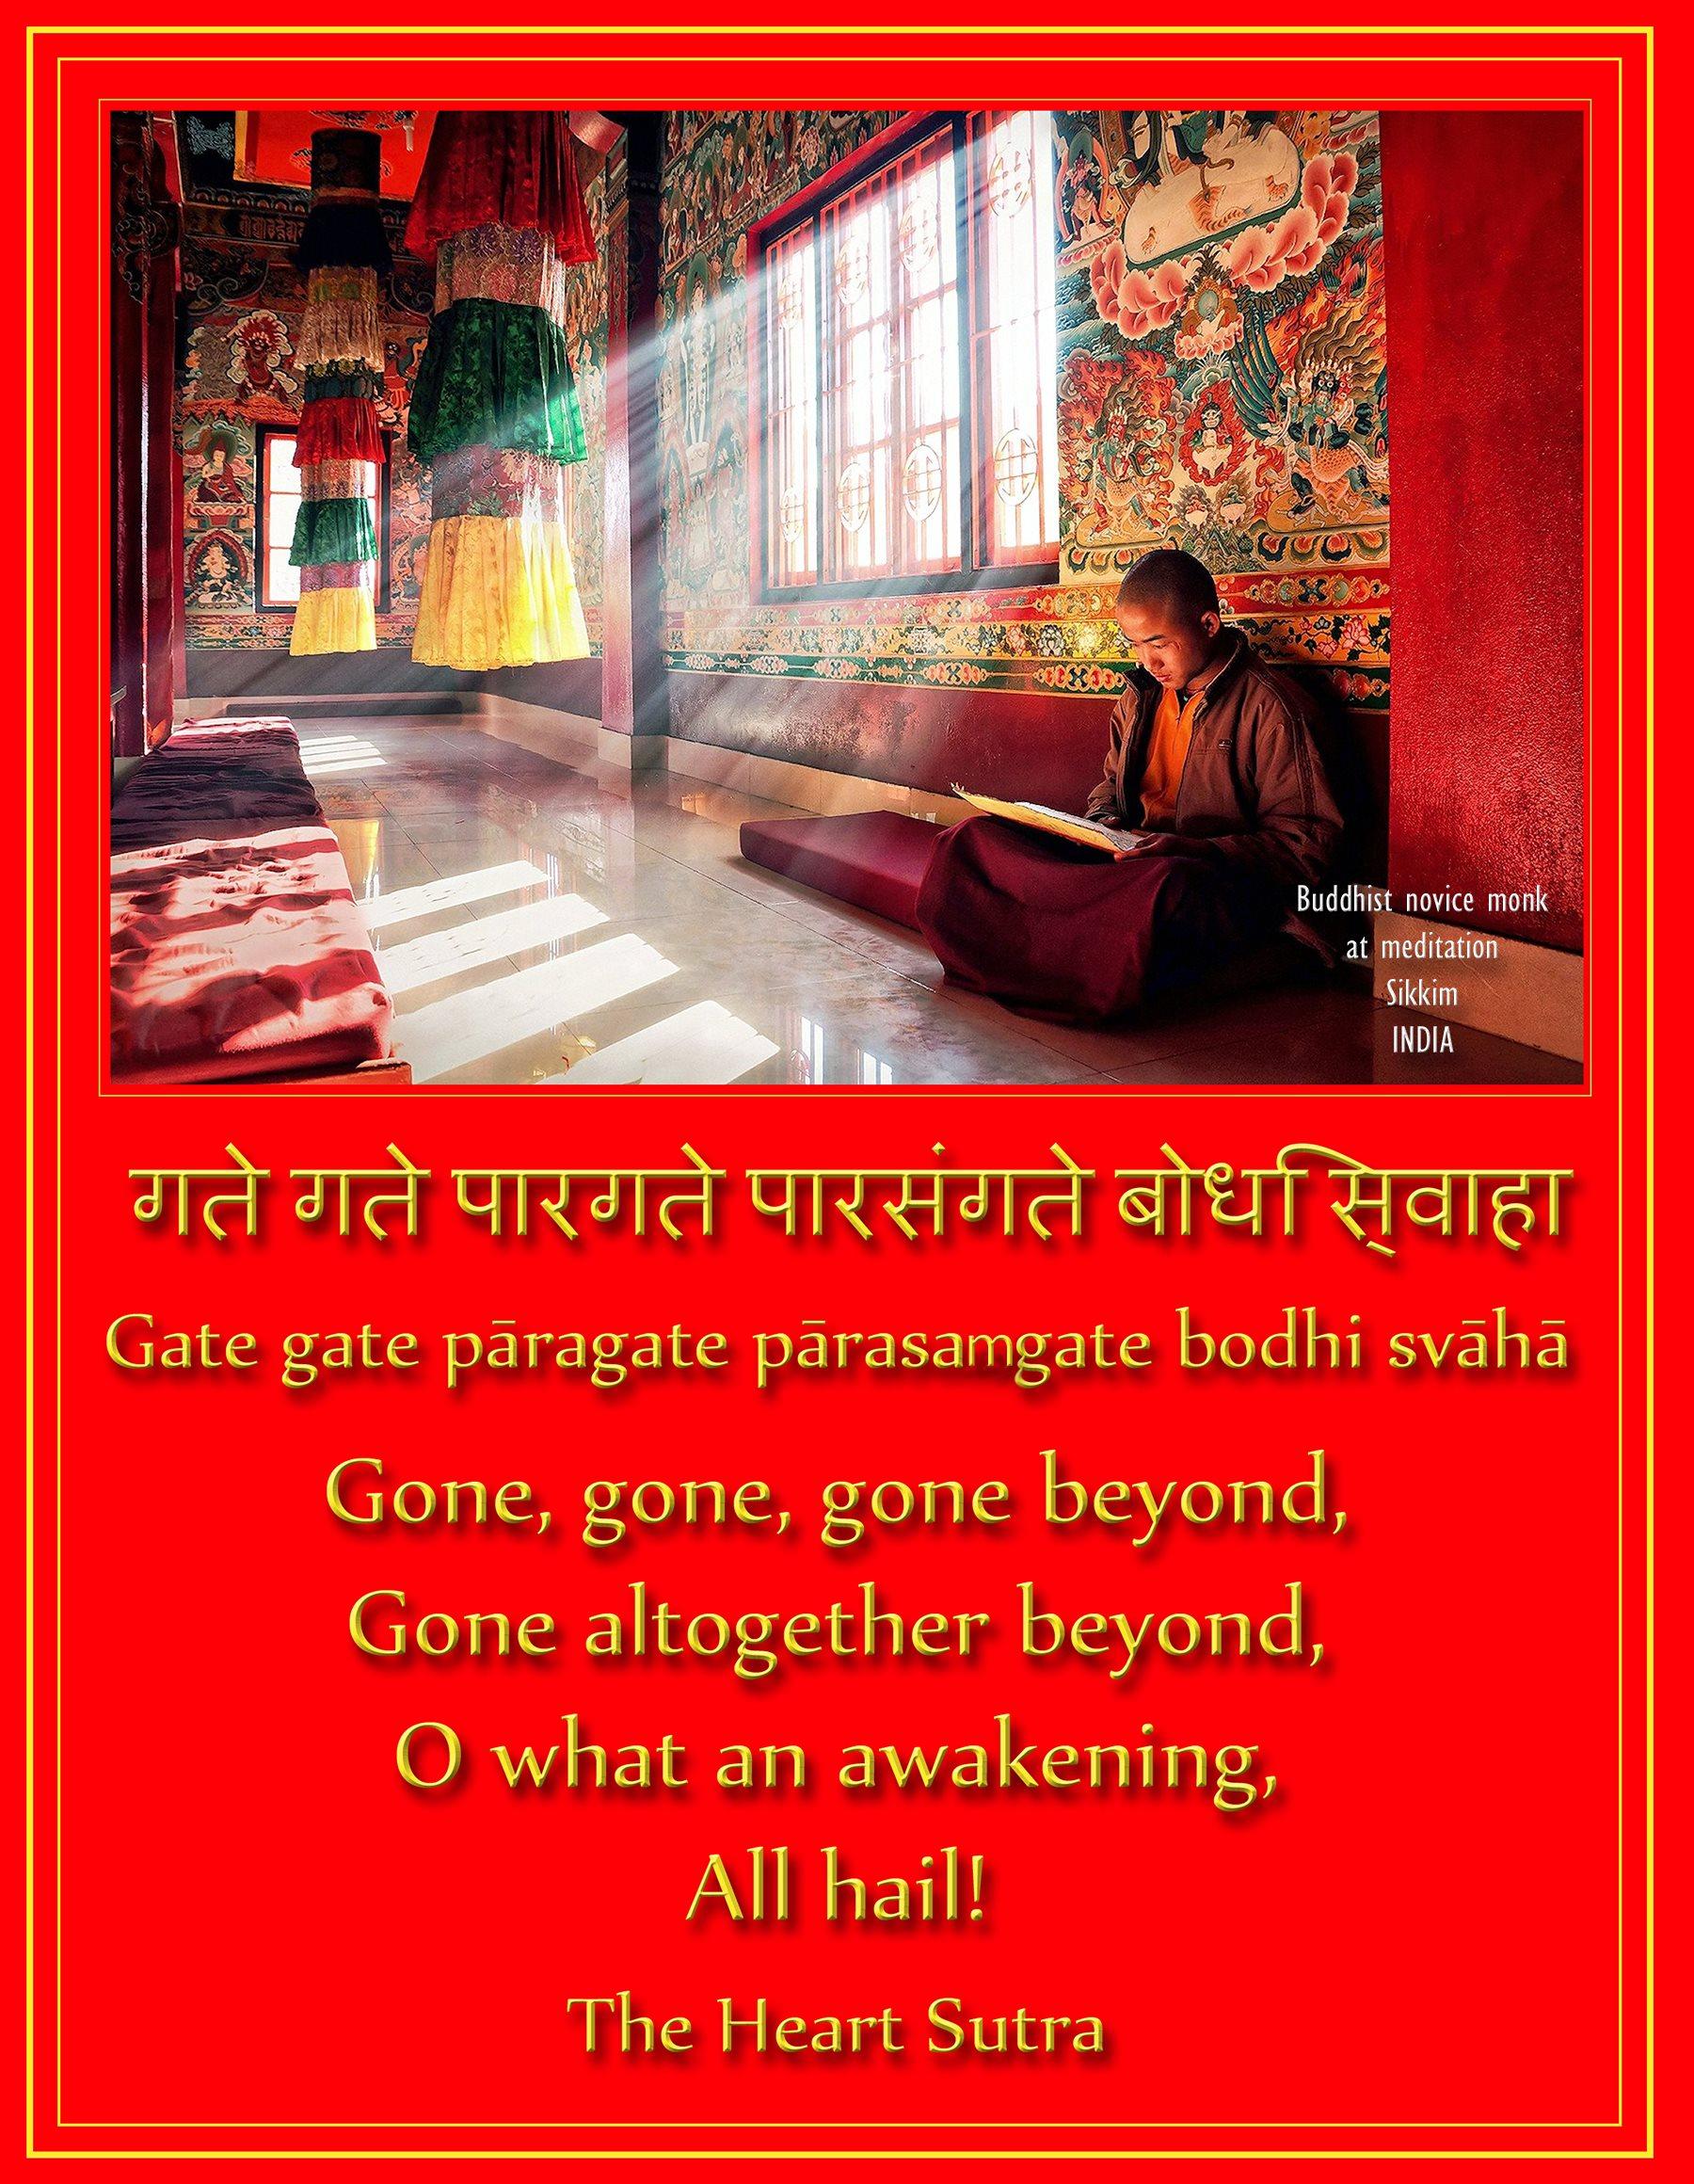 00 Yuri Biryukov. Silence and meditation. Sikkim, India. The Heart Sutra. 12.07.15